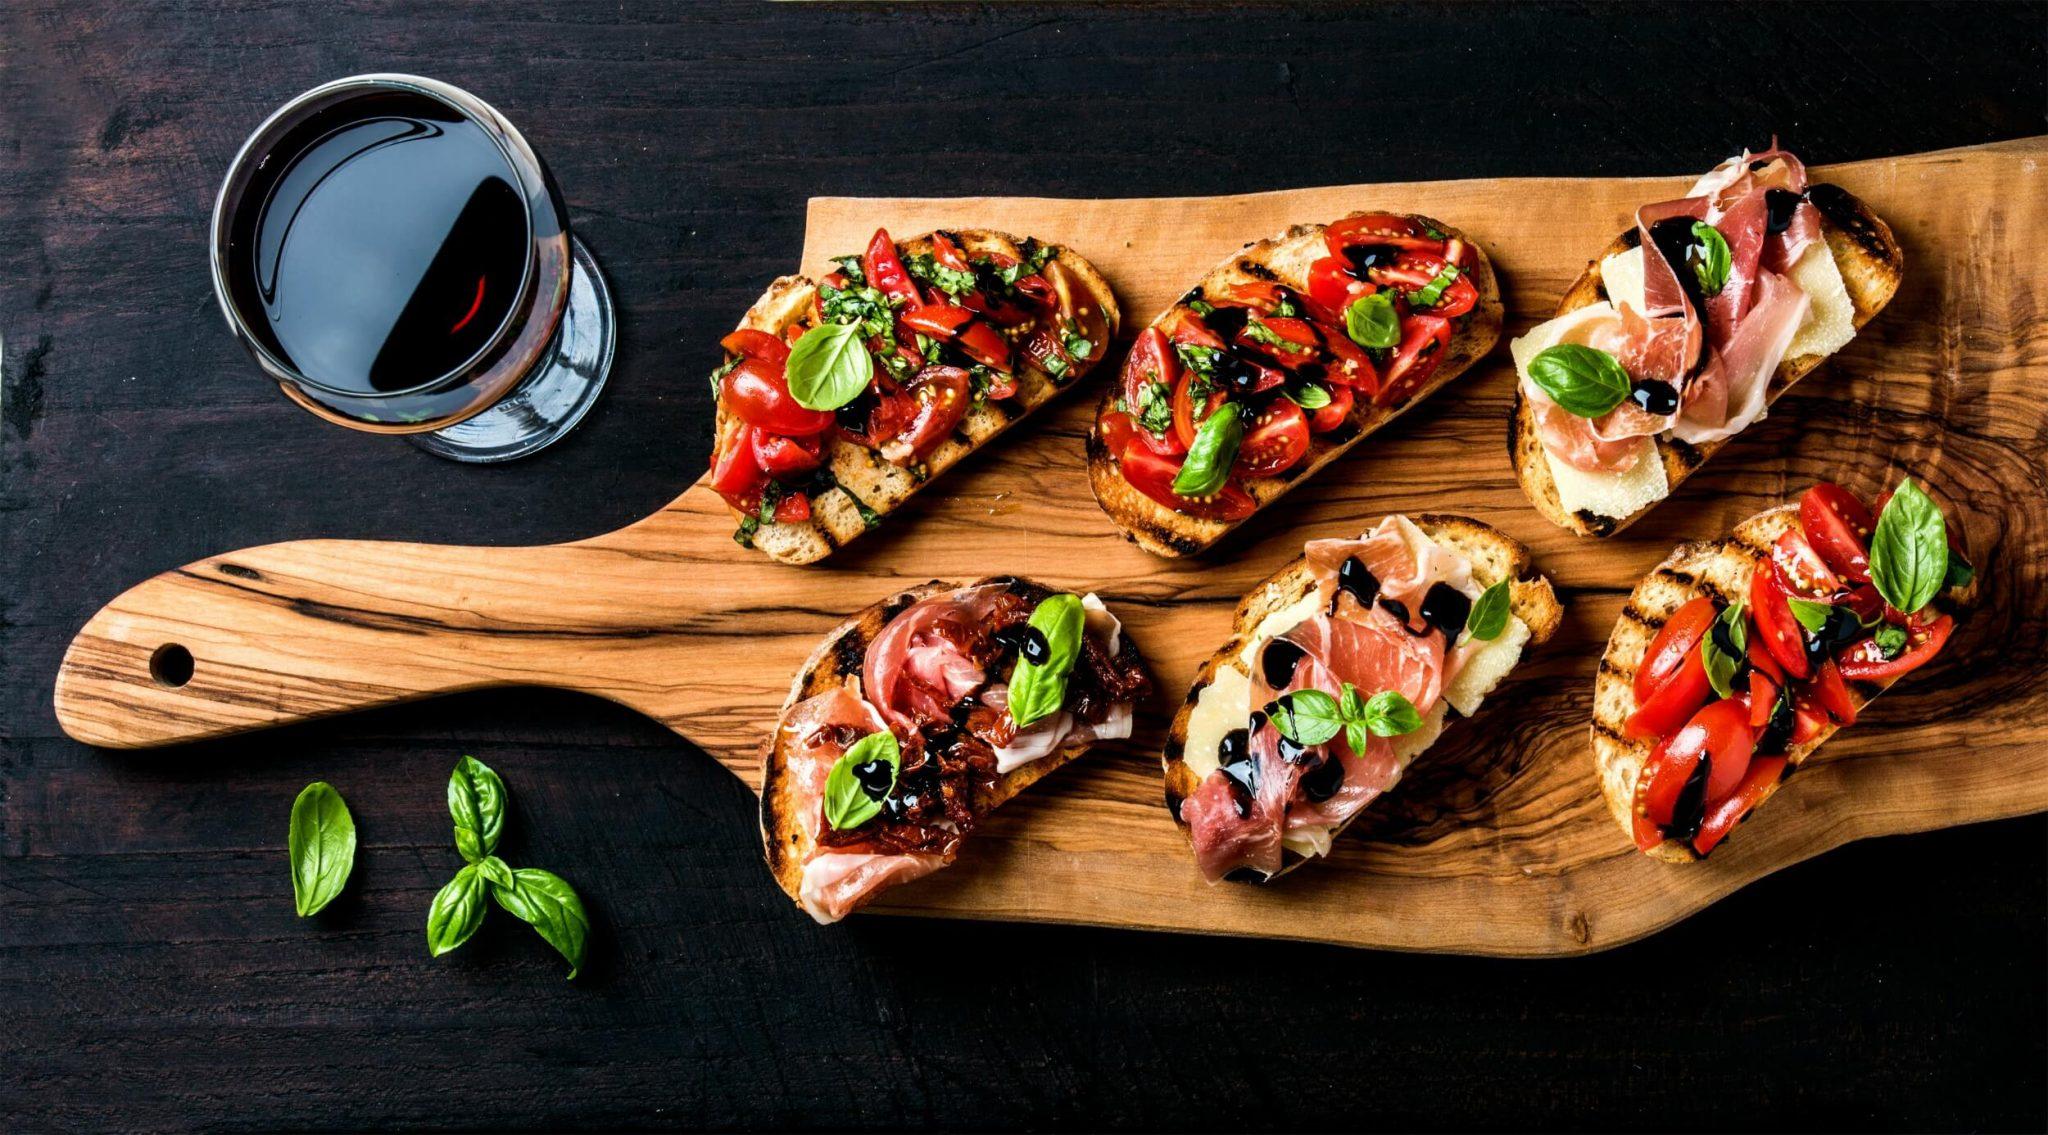 Italian wine bruscetta